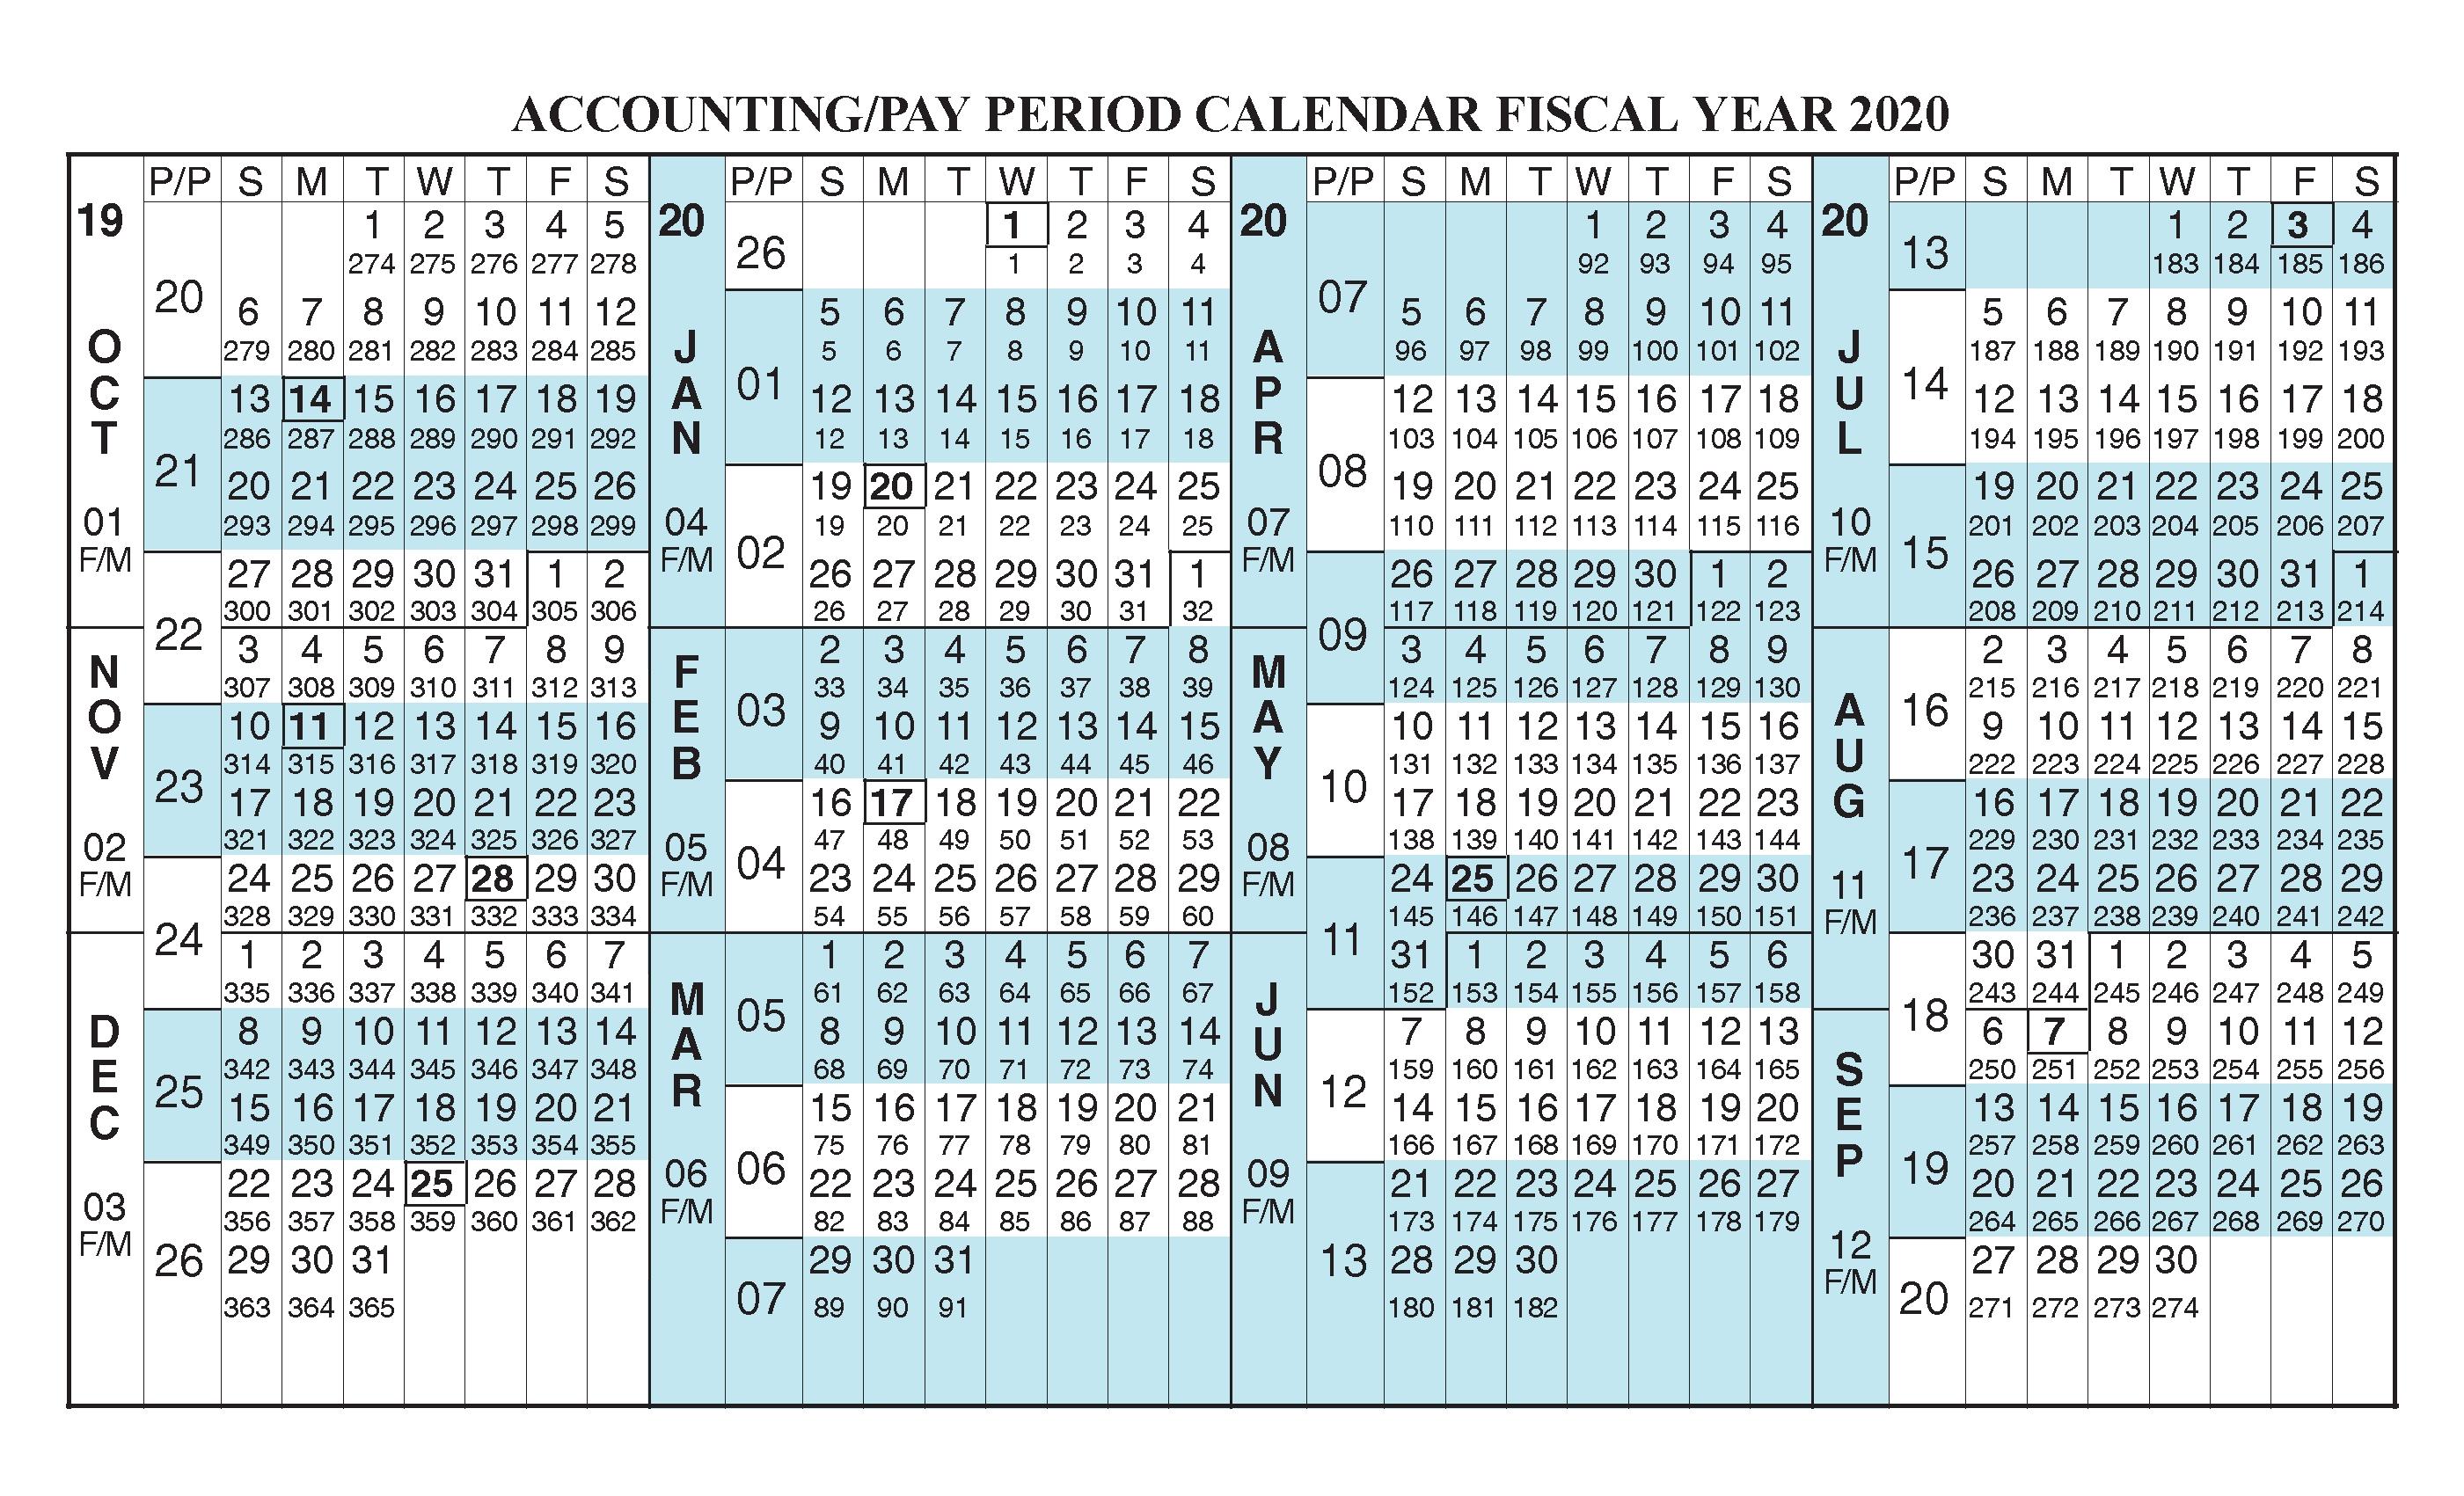 Payroll Calendar 2020 Fiscal Year Calendar [ Oct 2019 - Sep with Fiscal Calander 2020 Week Numbers